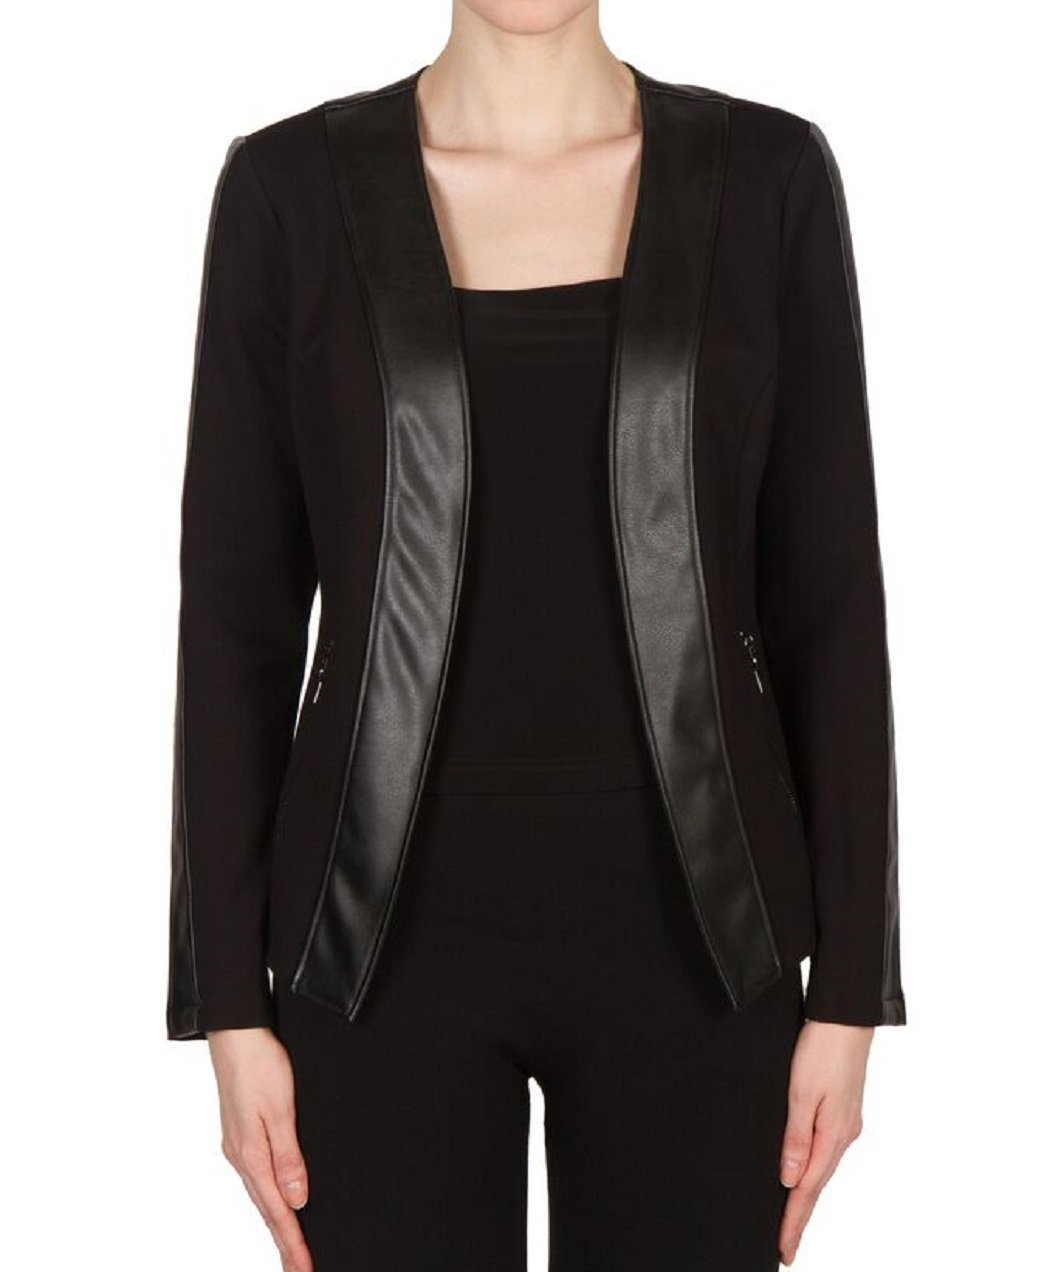 Joseph Ribkoff Black Leatherette Trim Jacket Style 173400 Size 8